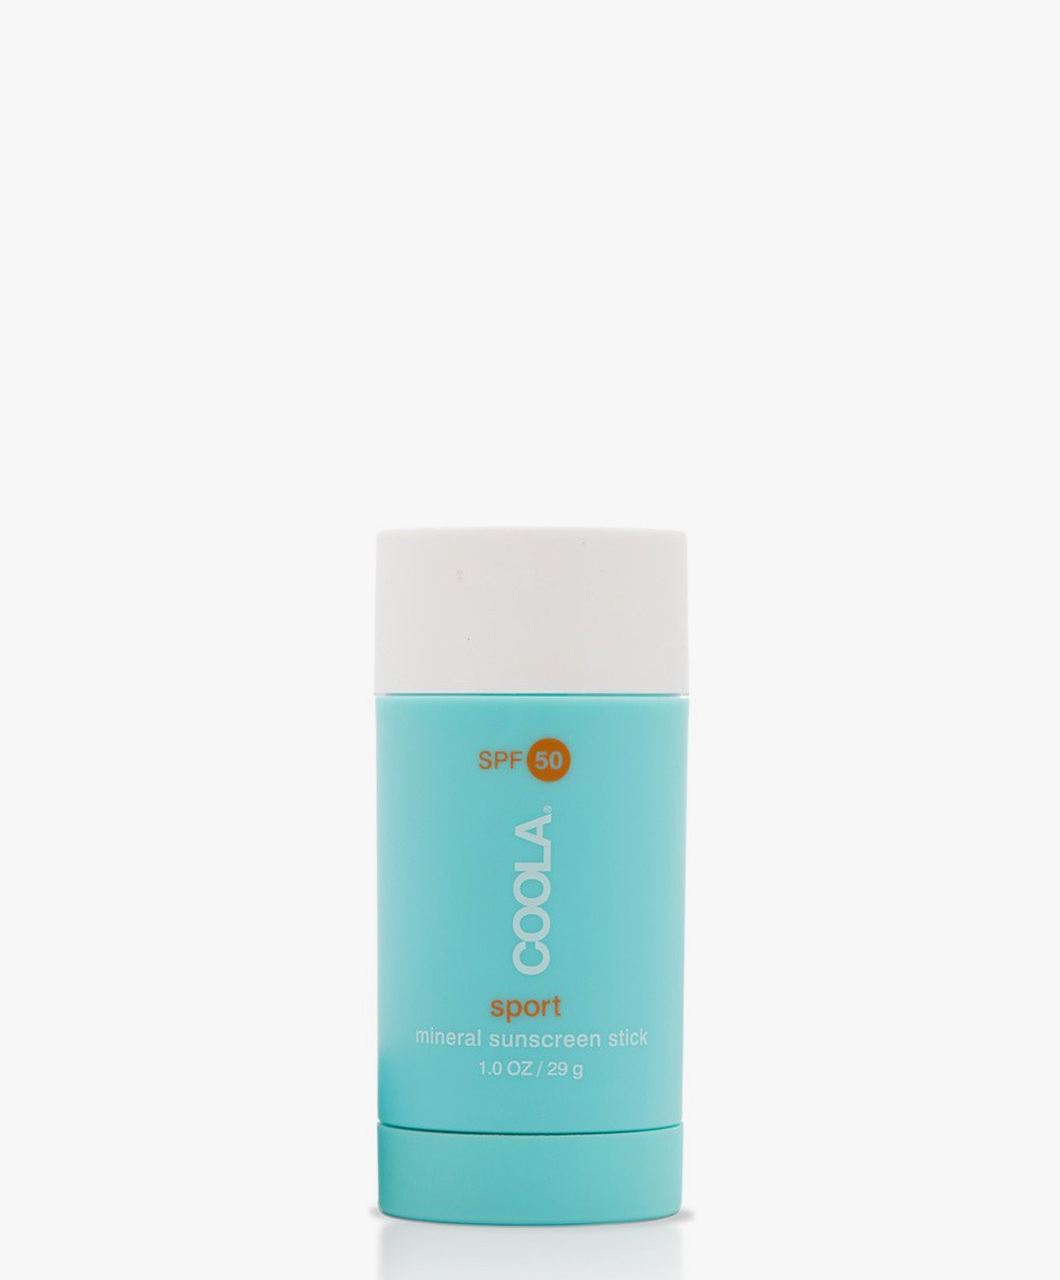 Afbeelding van COOLA Mineral Sport SPF 50 Organic Sunscreen Stick